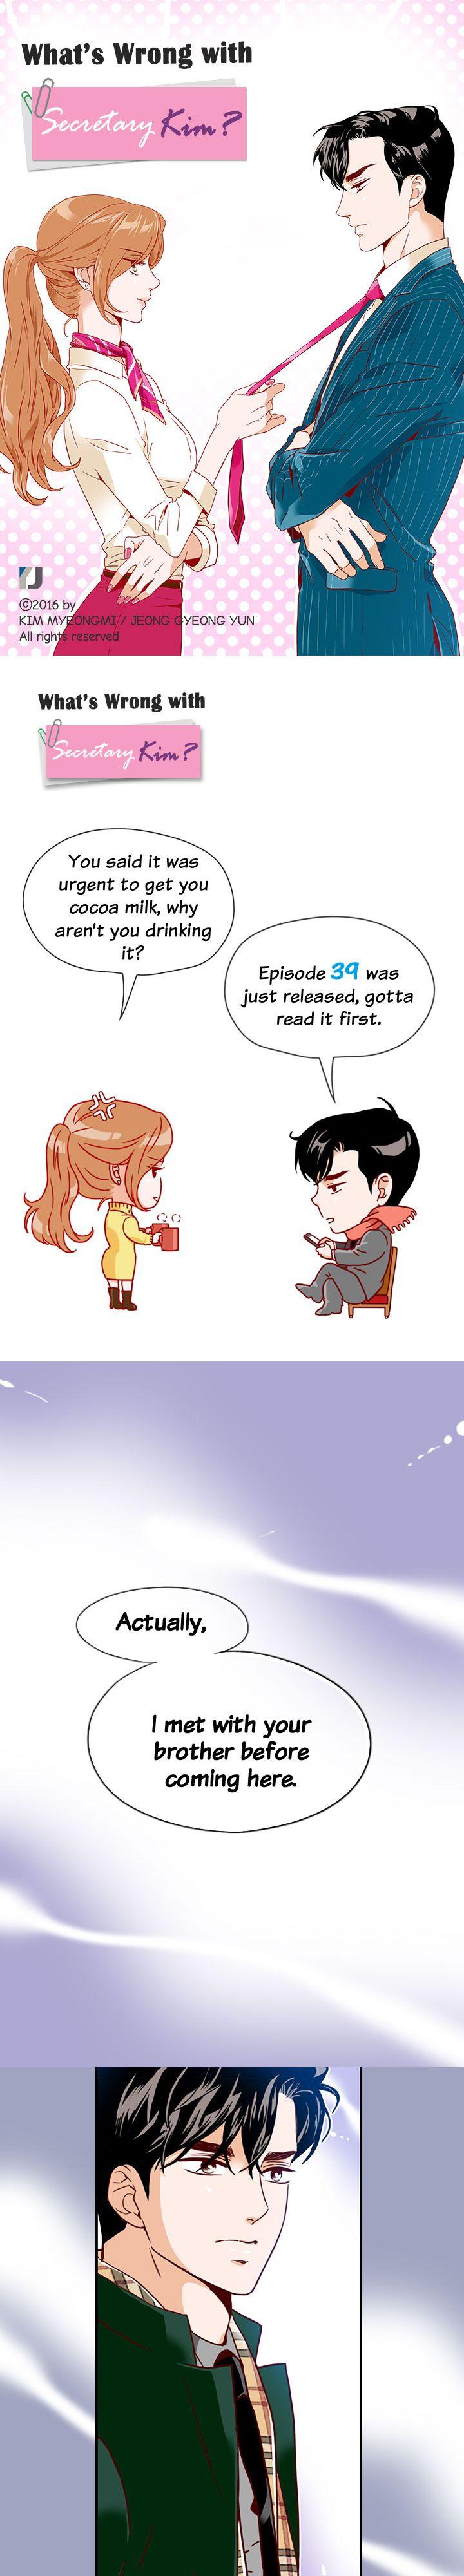 https://manga.mangadogs.com/comics/pic2/15/25807/960696/314a07f9848eeff2f90ae29152999894.jpg Page 1